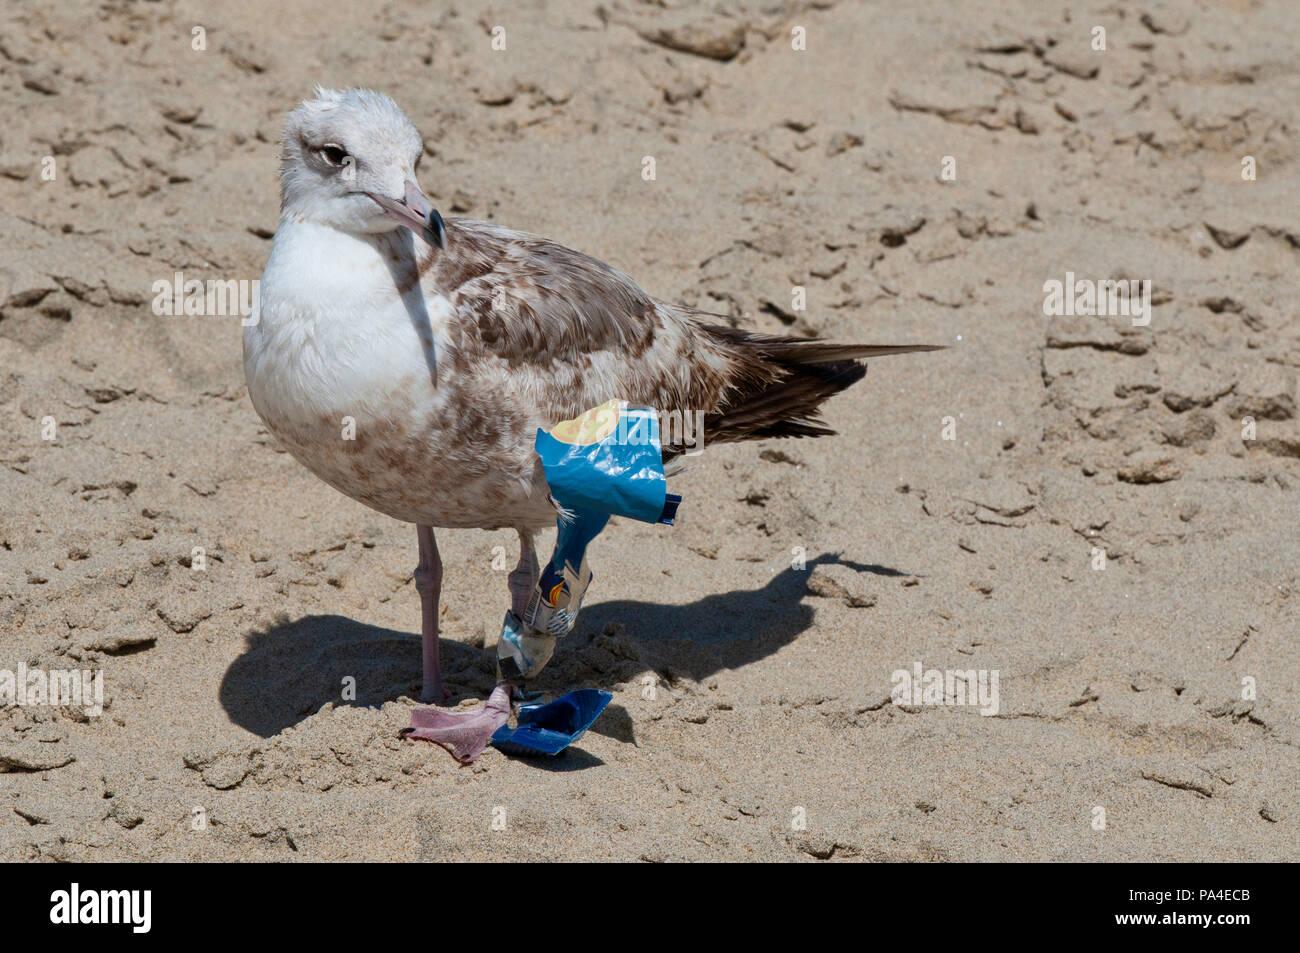 gull with garbage stuck on leg on a beach in Baja California Sur near Todos Santos - Stock Image